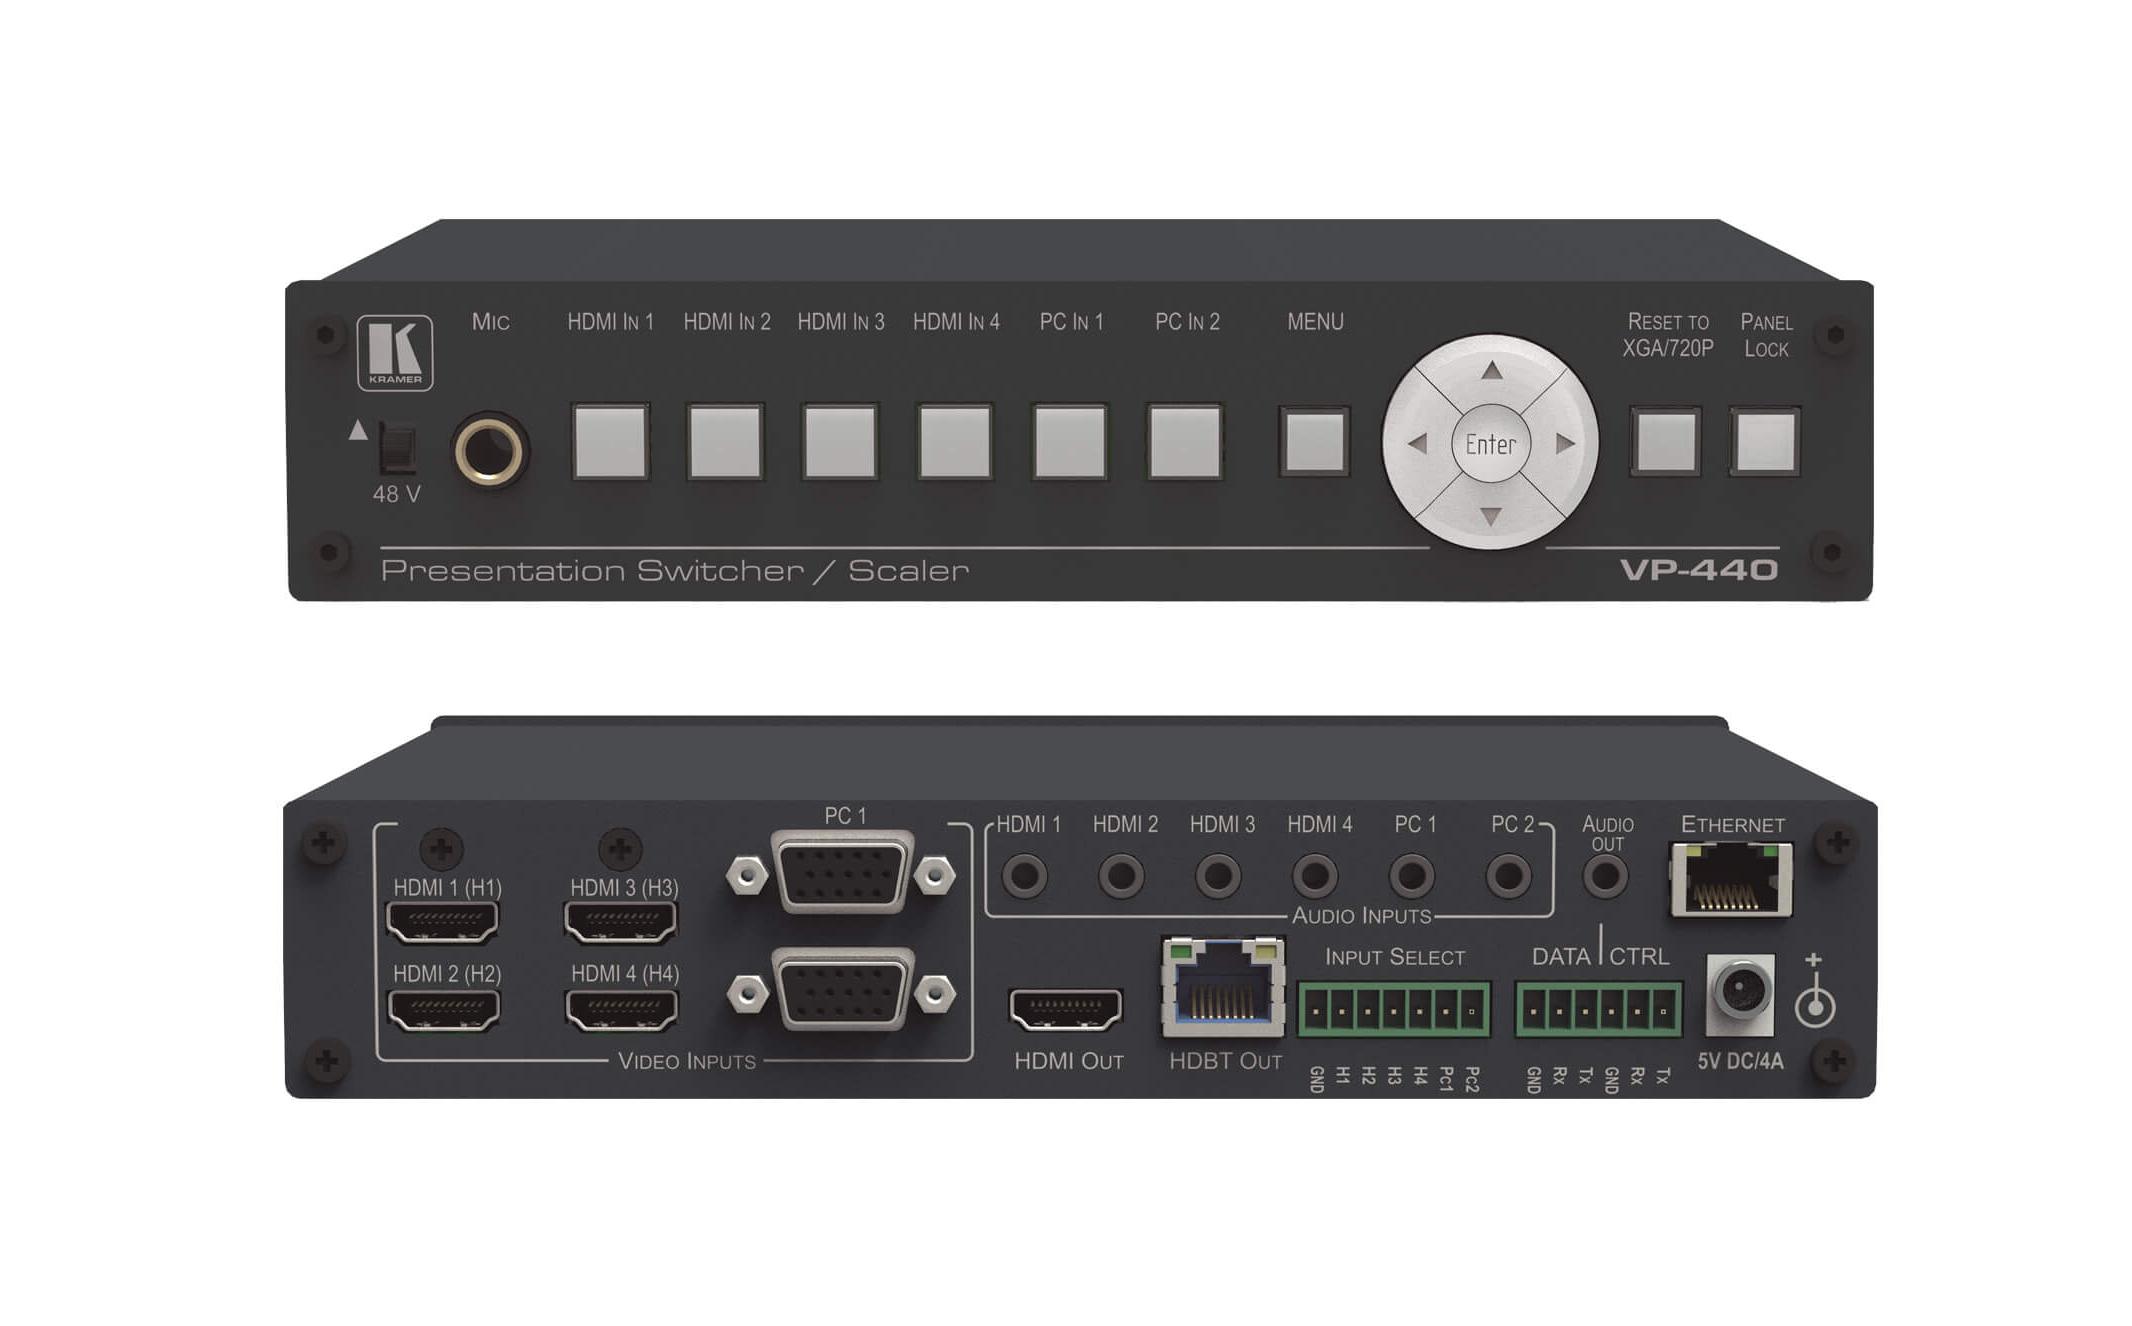 6 Input HDMI & VGA to HDMI